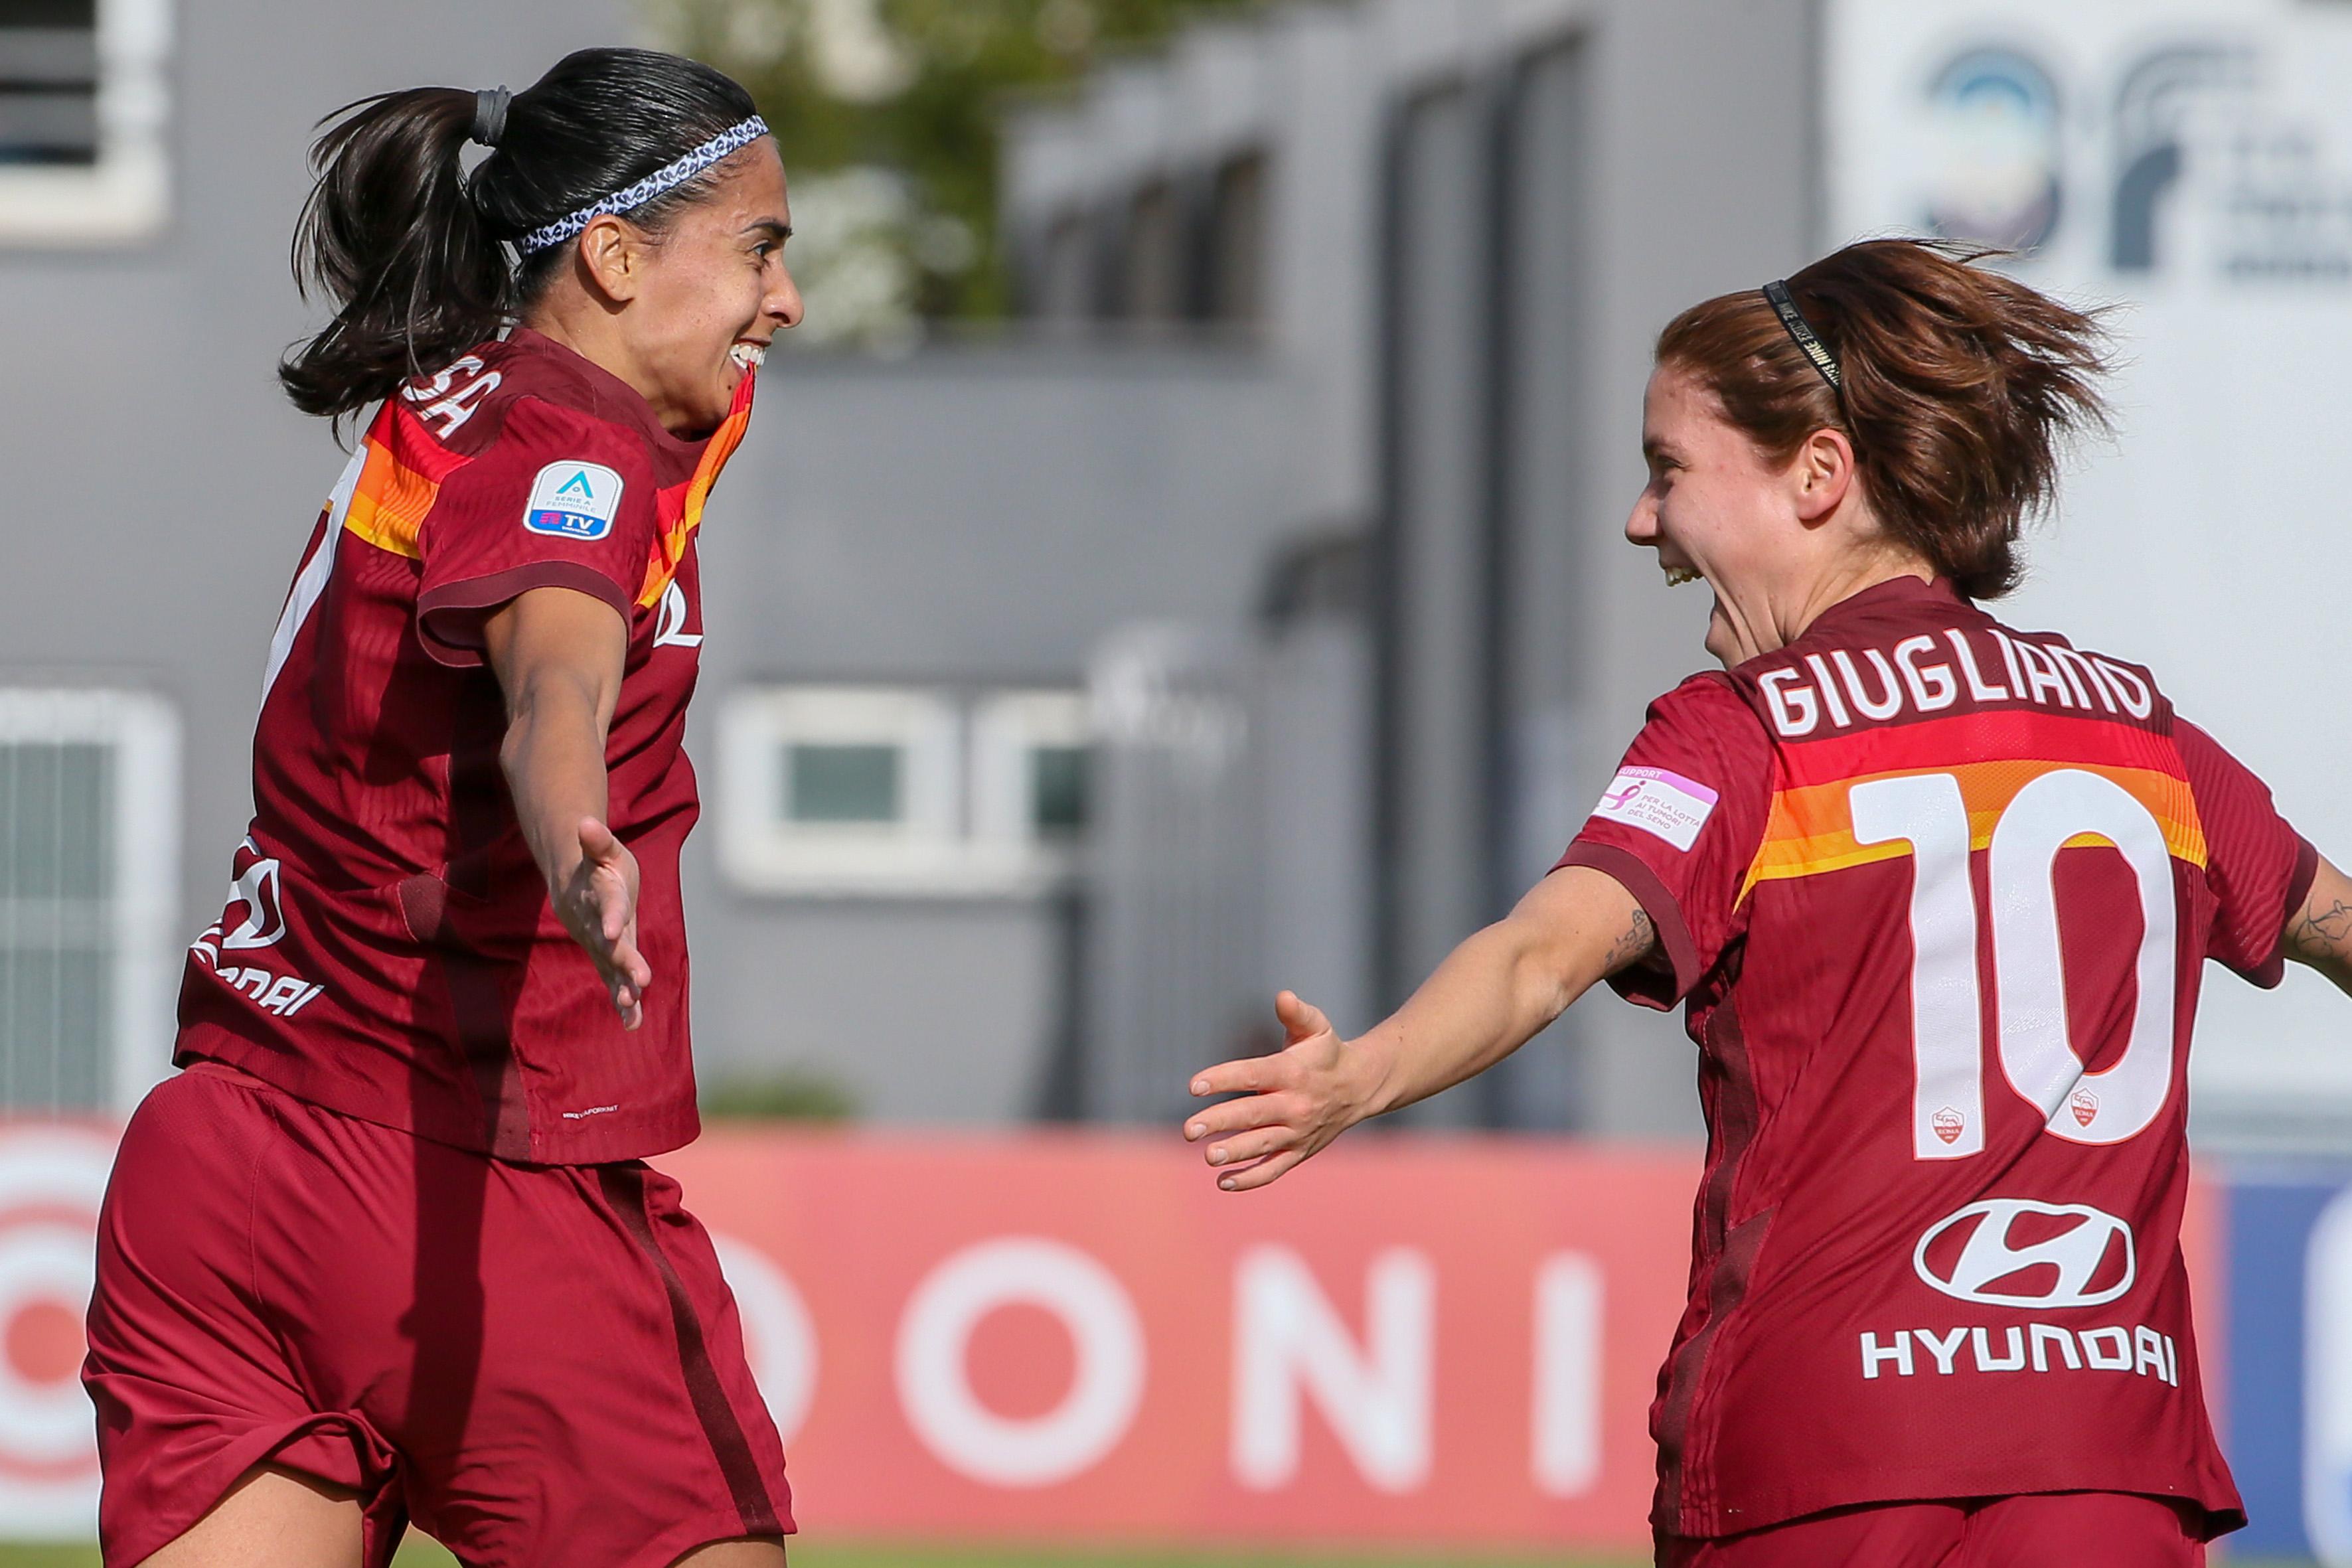 AS Roma v US Sassuolo - Women's Serie A